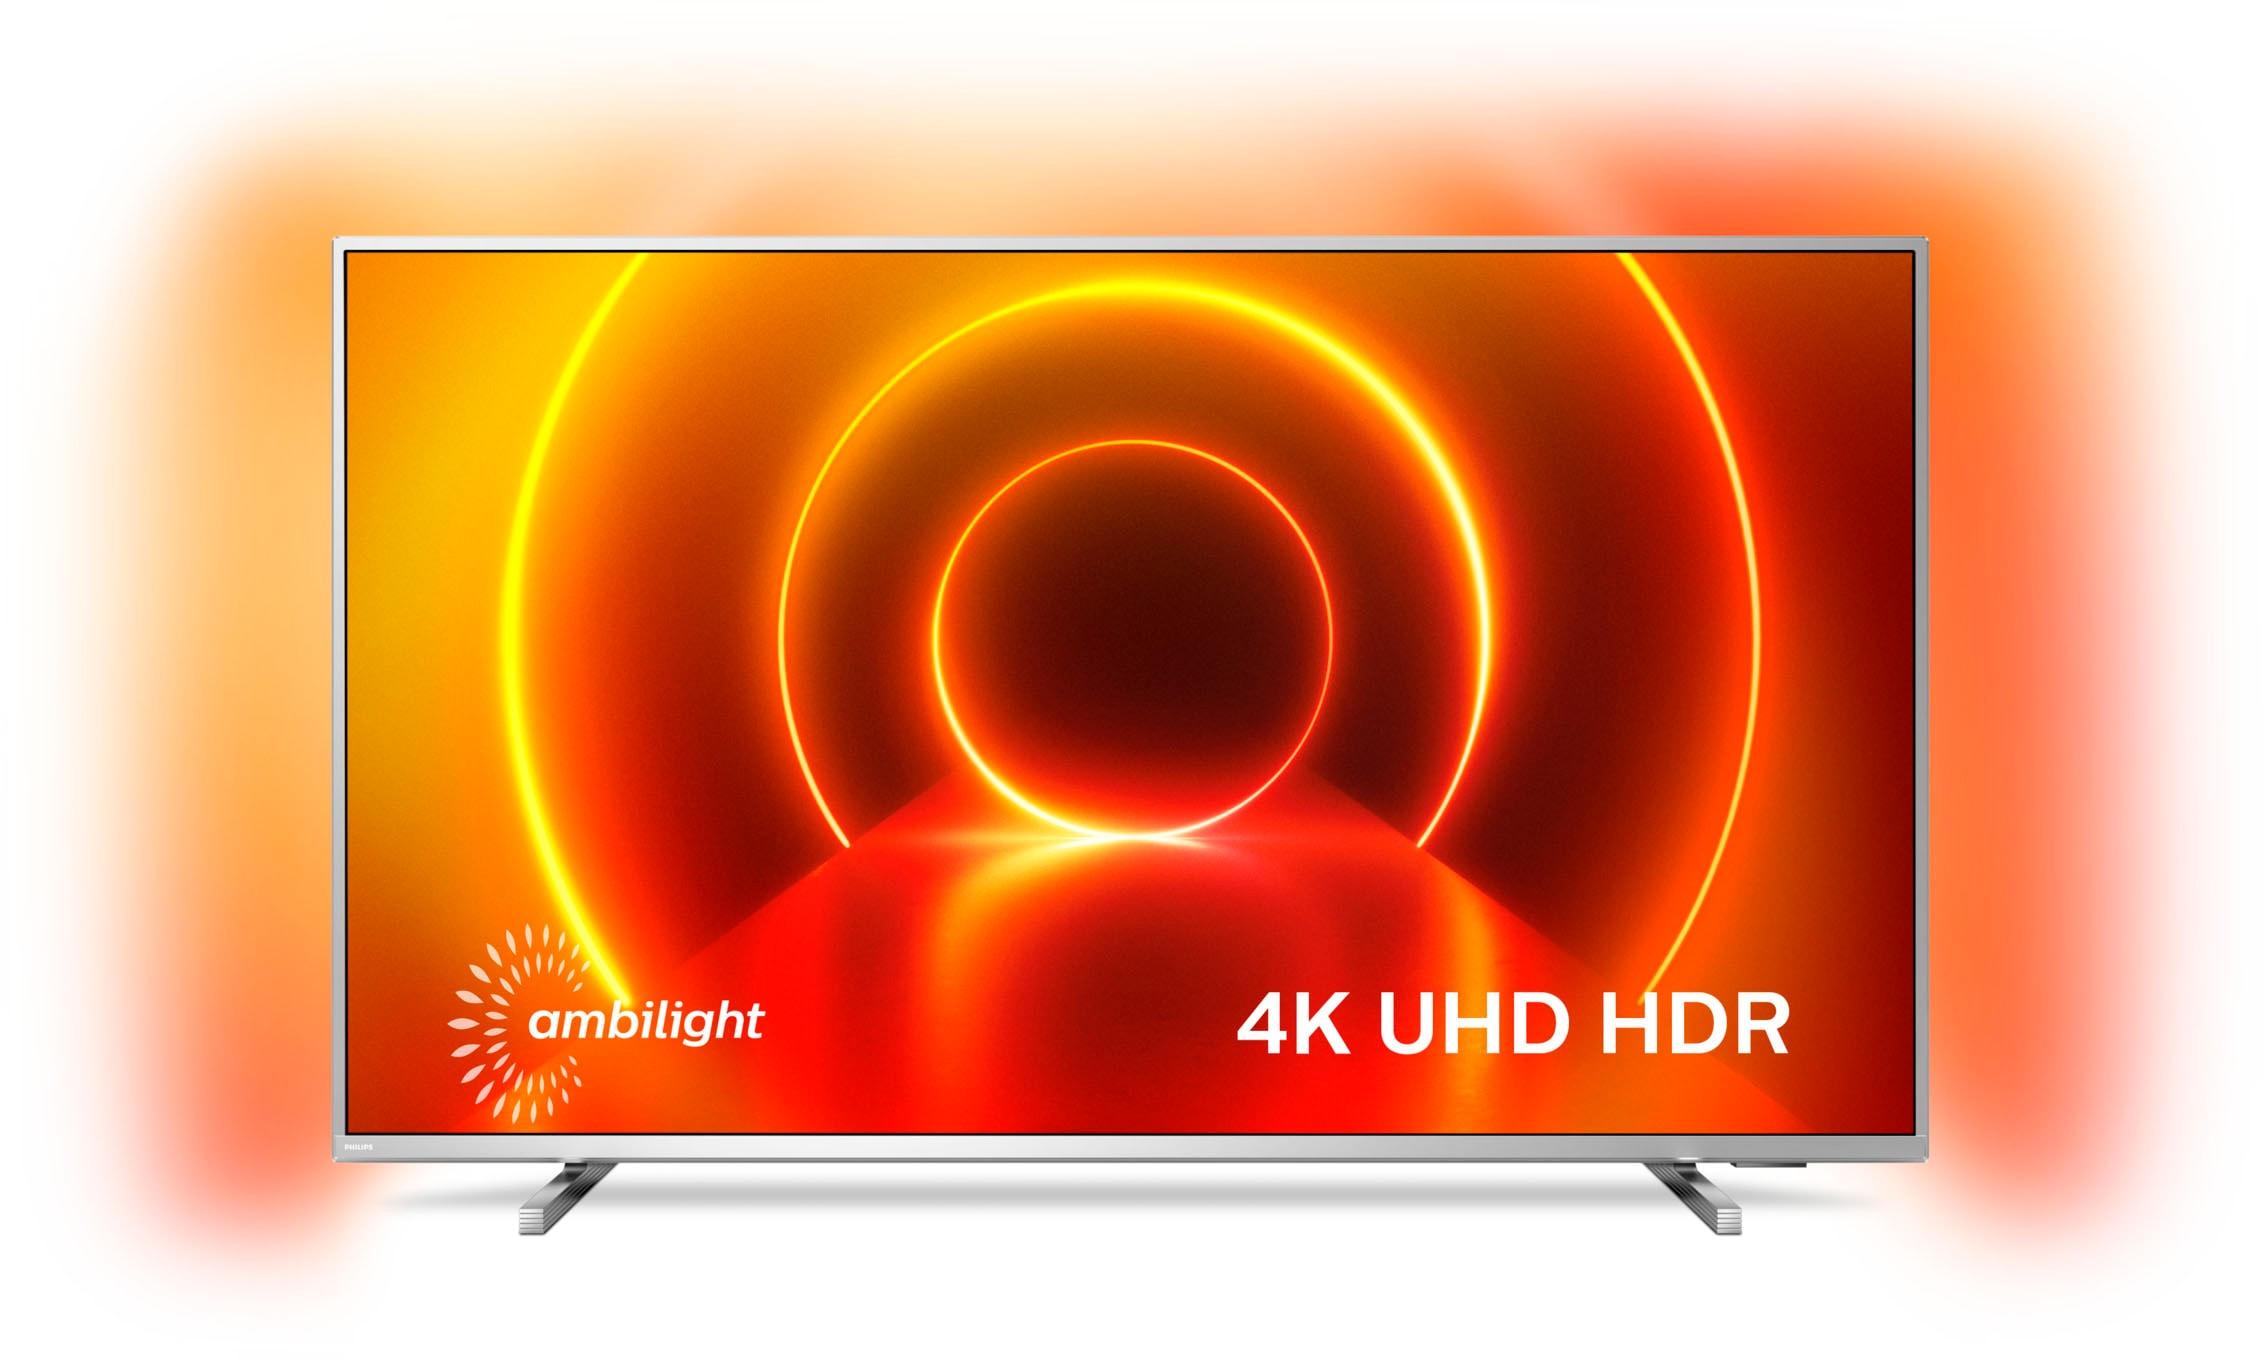 Philips LED-Fernseher 50PUS8105 12 , 126 cm 50 , 4K Ultra HD, Smart-TV, 3-seitiges Ambilght